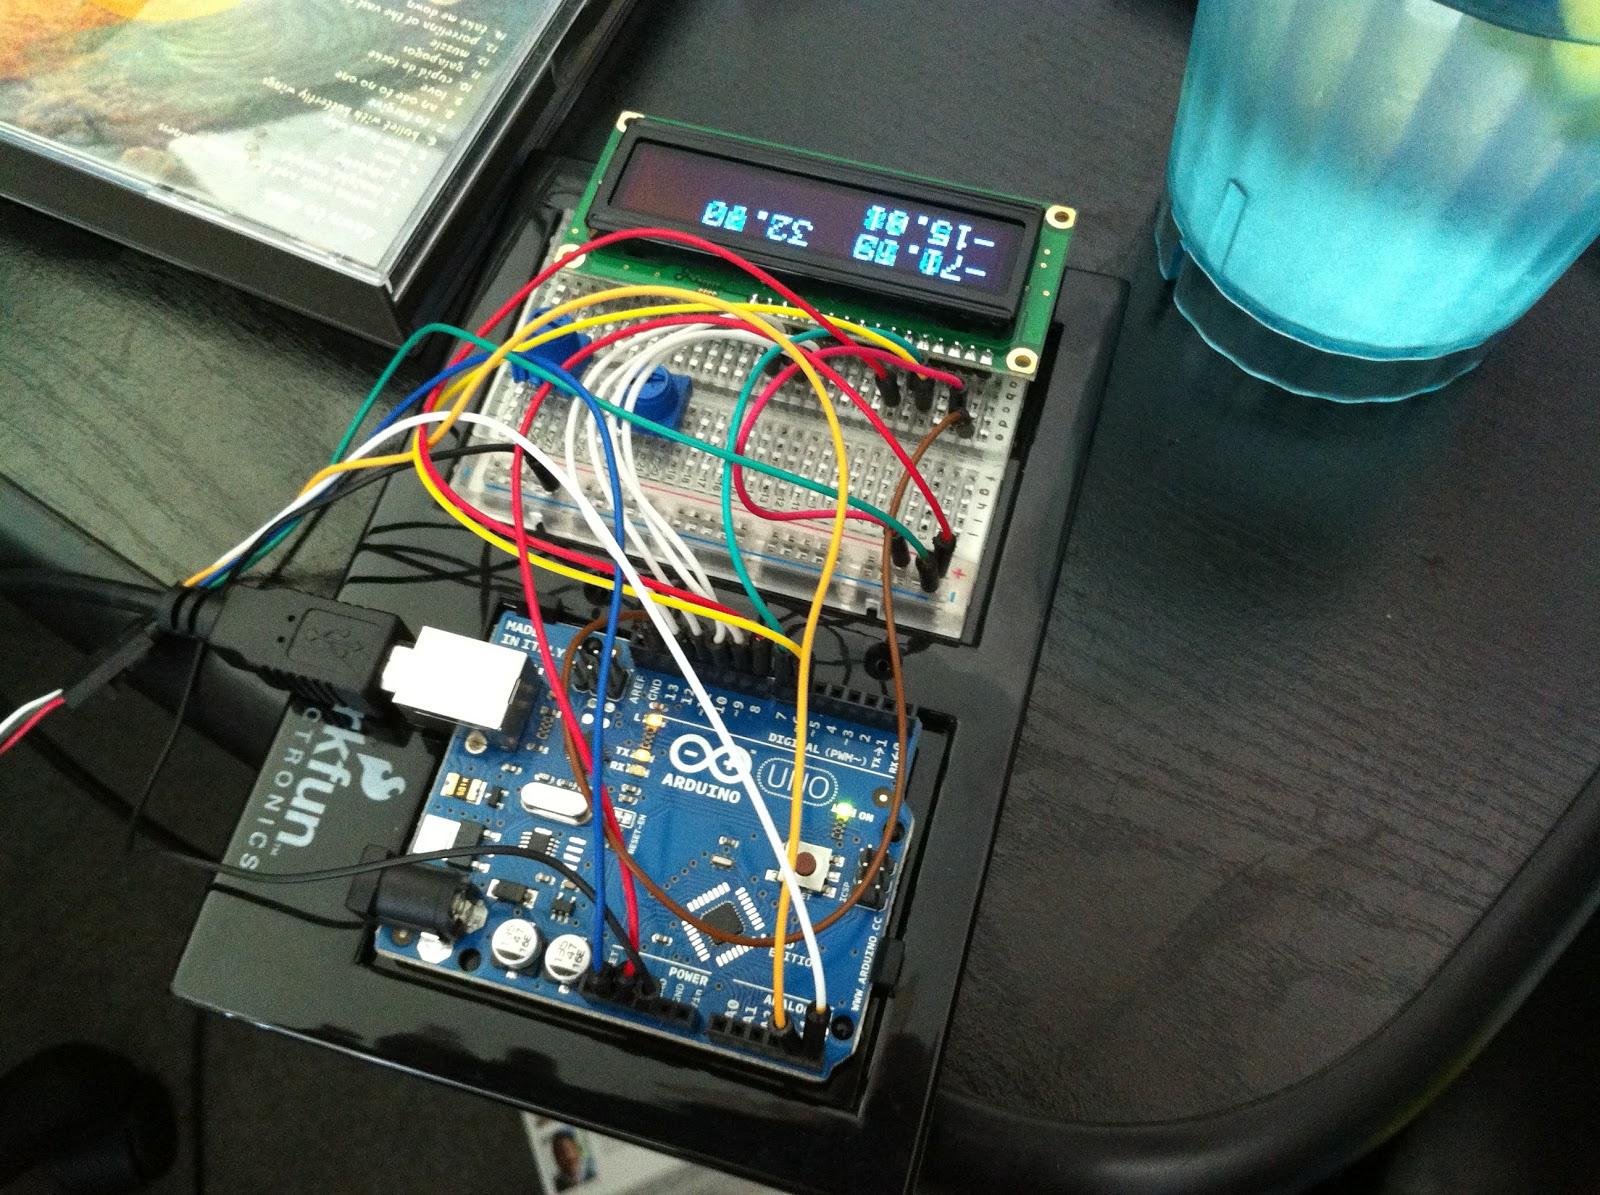 EastBay RC: Maya Camera Control With Arduino-Based Sensors